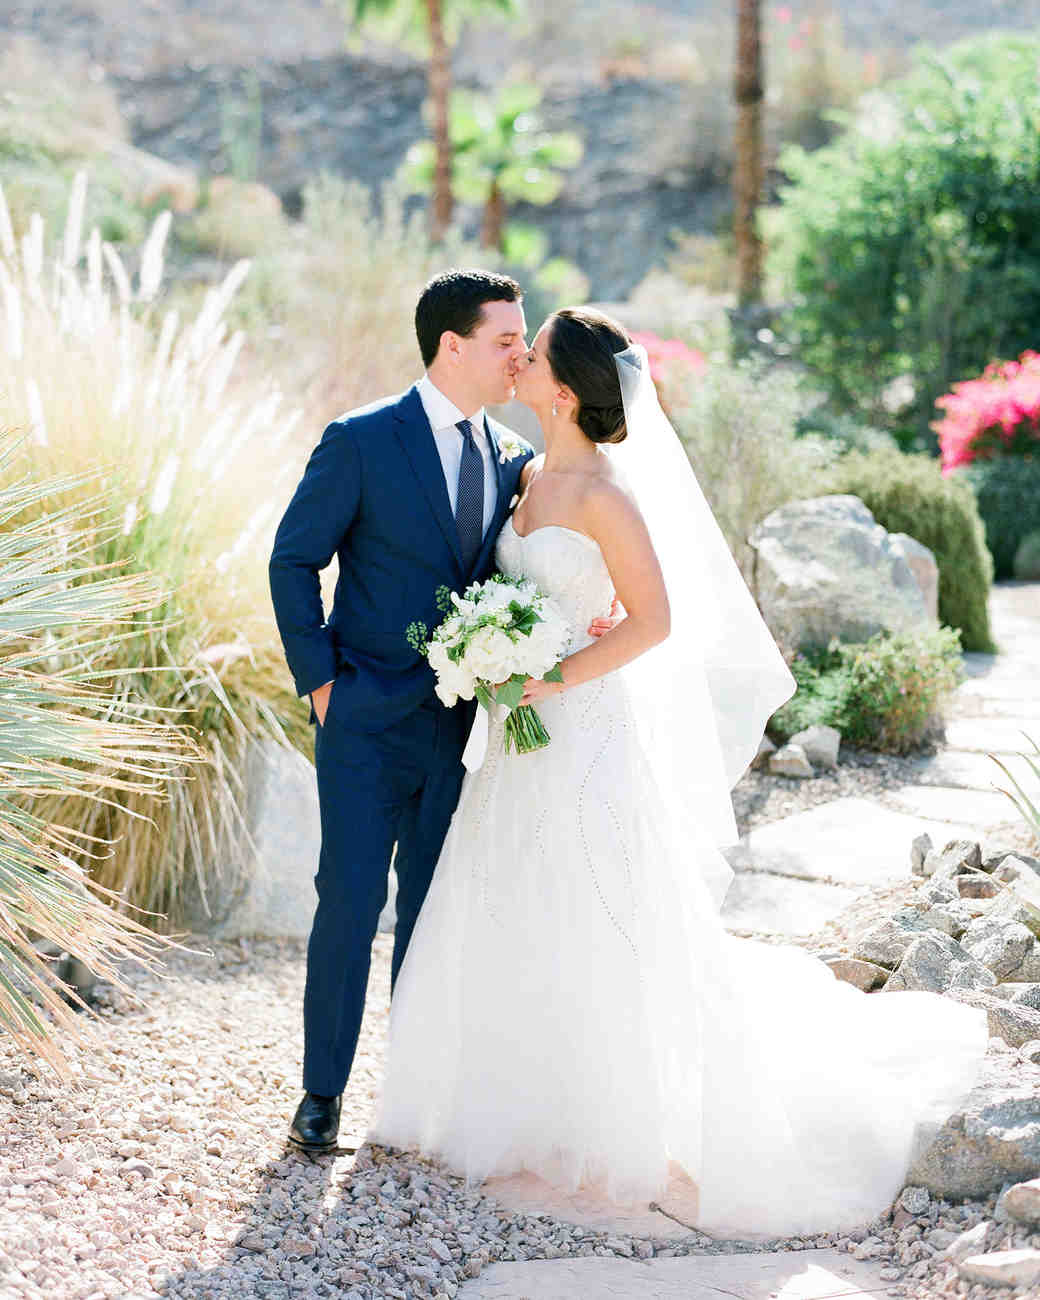 tali-mike-wedding-california-couple-58810014-s112346.jpg